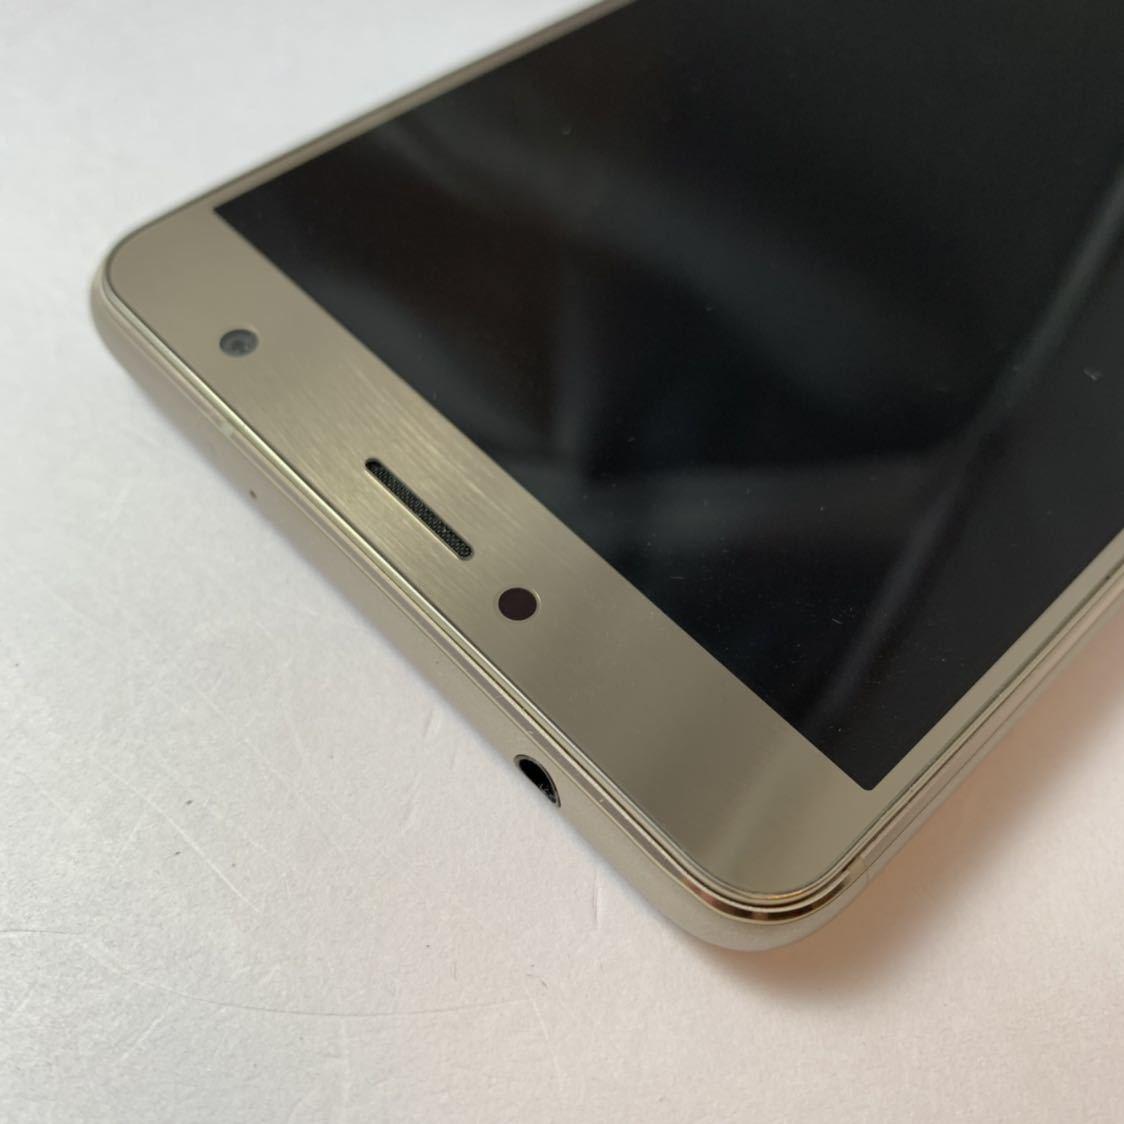 ASUS Zenfone 3 Deluxe 5.5 ZS550KL 64GB SIMフリー 本体 Z01FD ゴールド 海外版_画像5